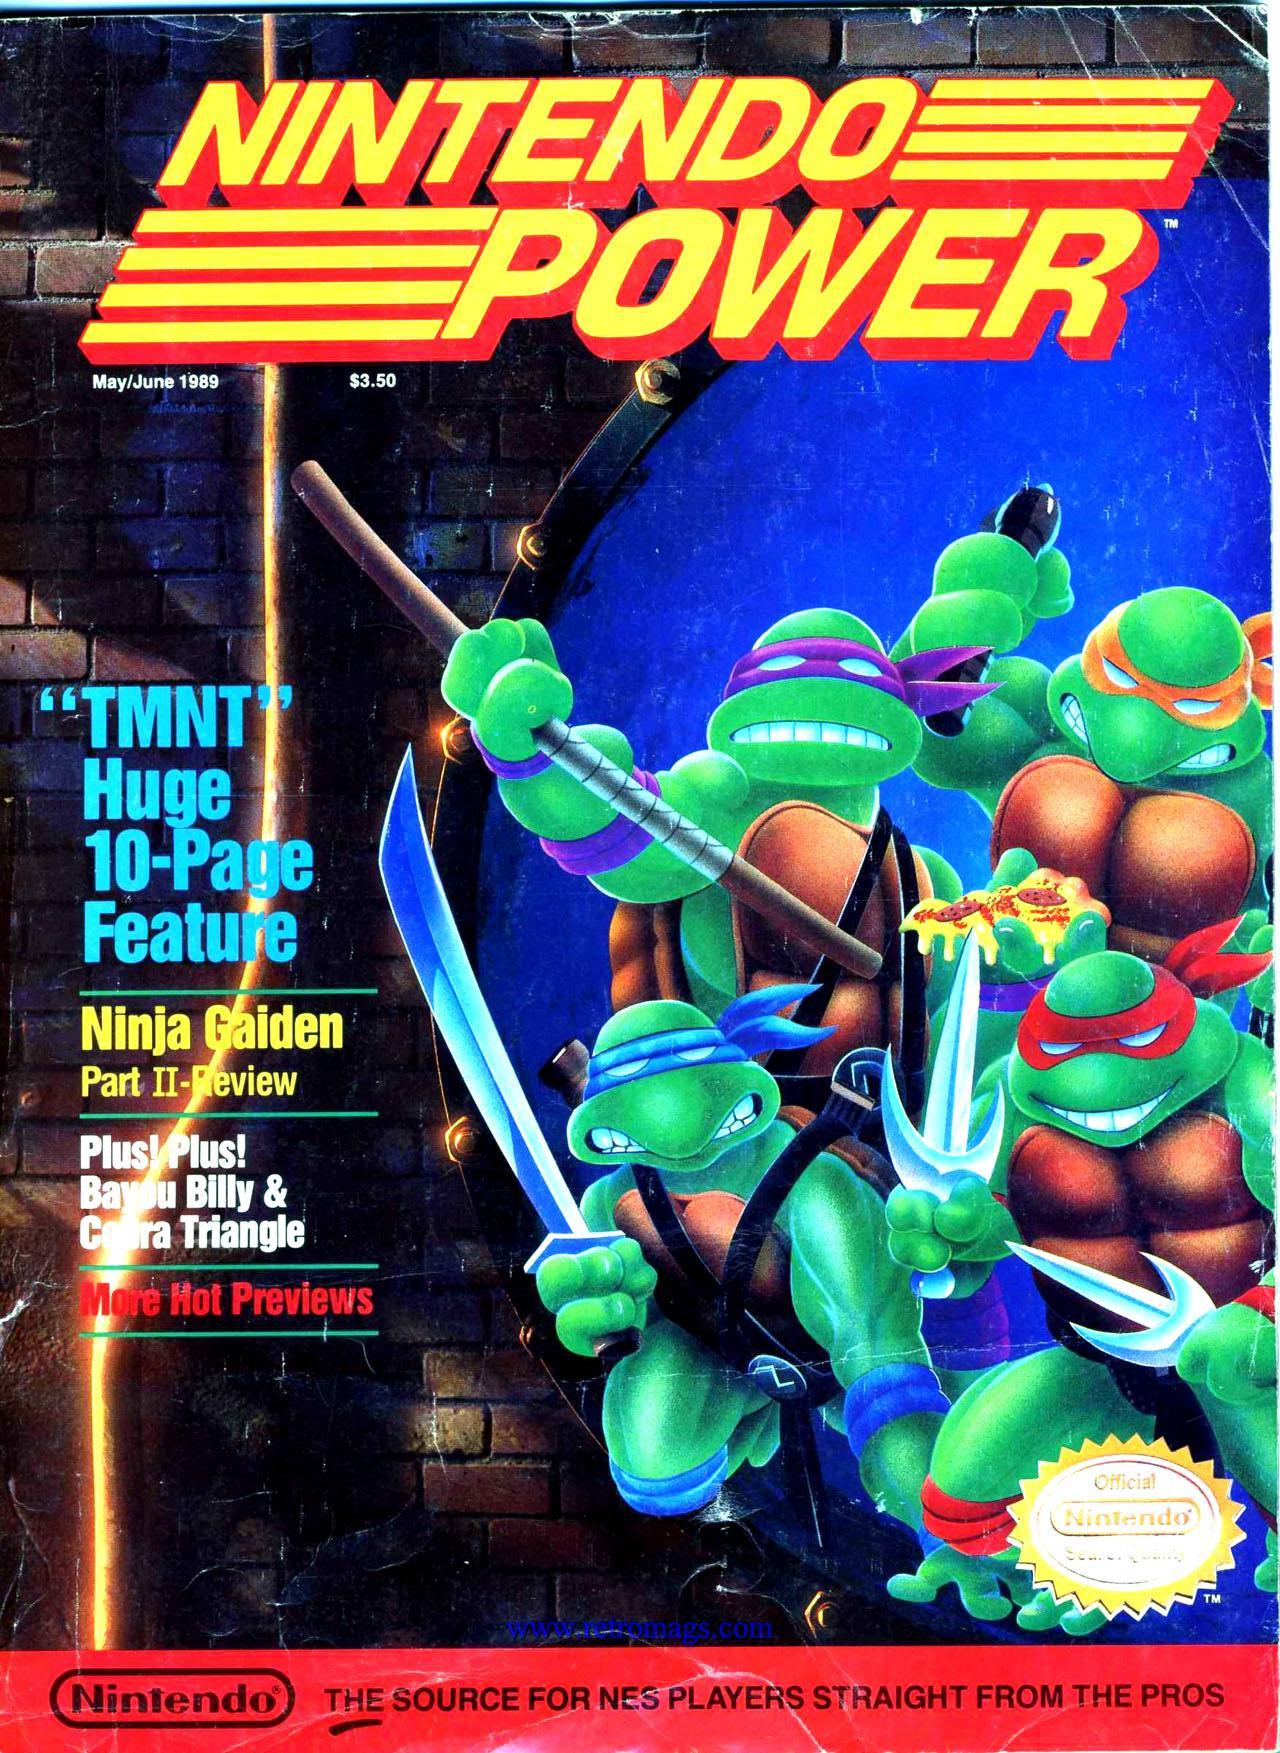 Nintendo Power Magazine Volume 70 Star Trek NBA Jam W/Poster